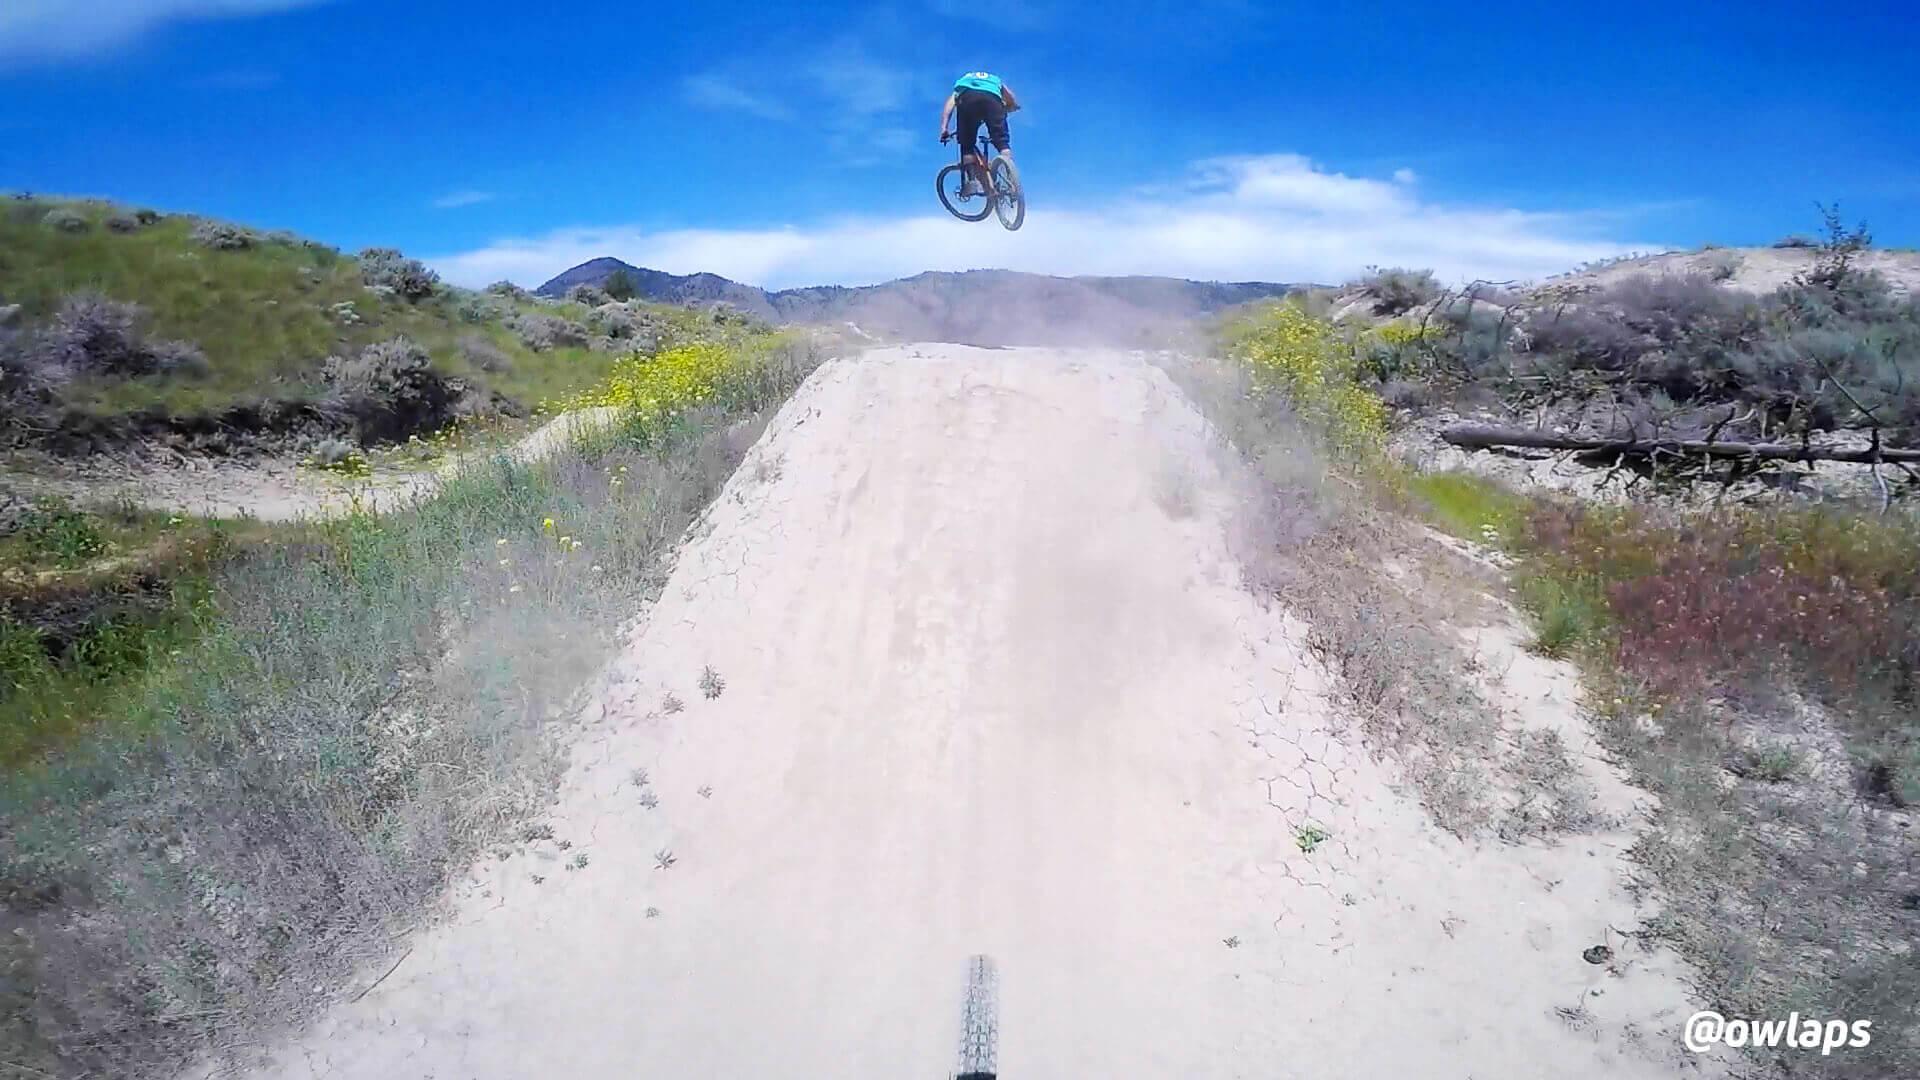 wrangler-kamloops-bike-ranch-canada-owlaps-HD-13